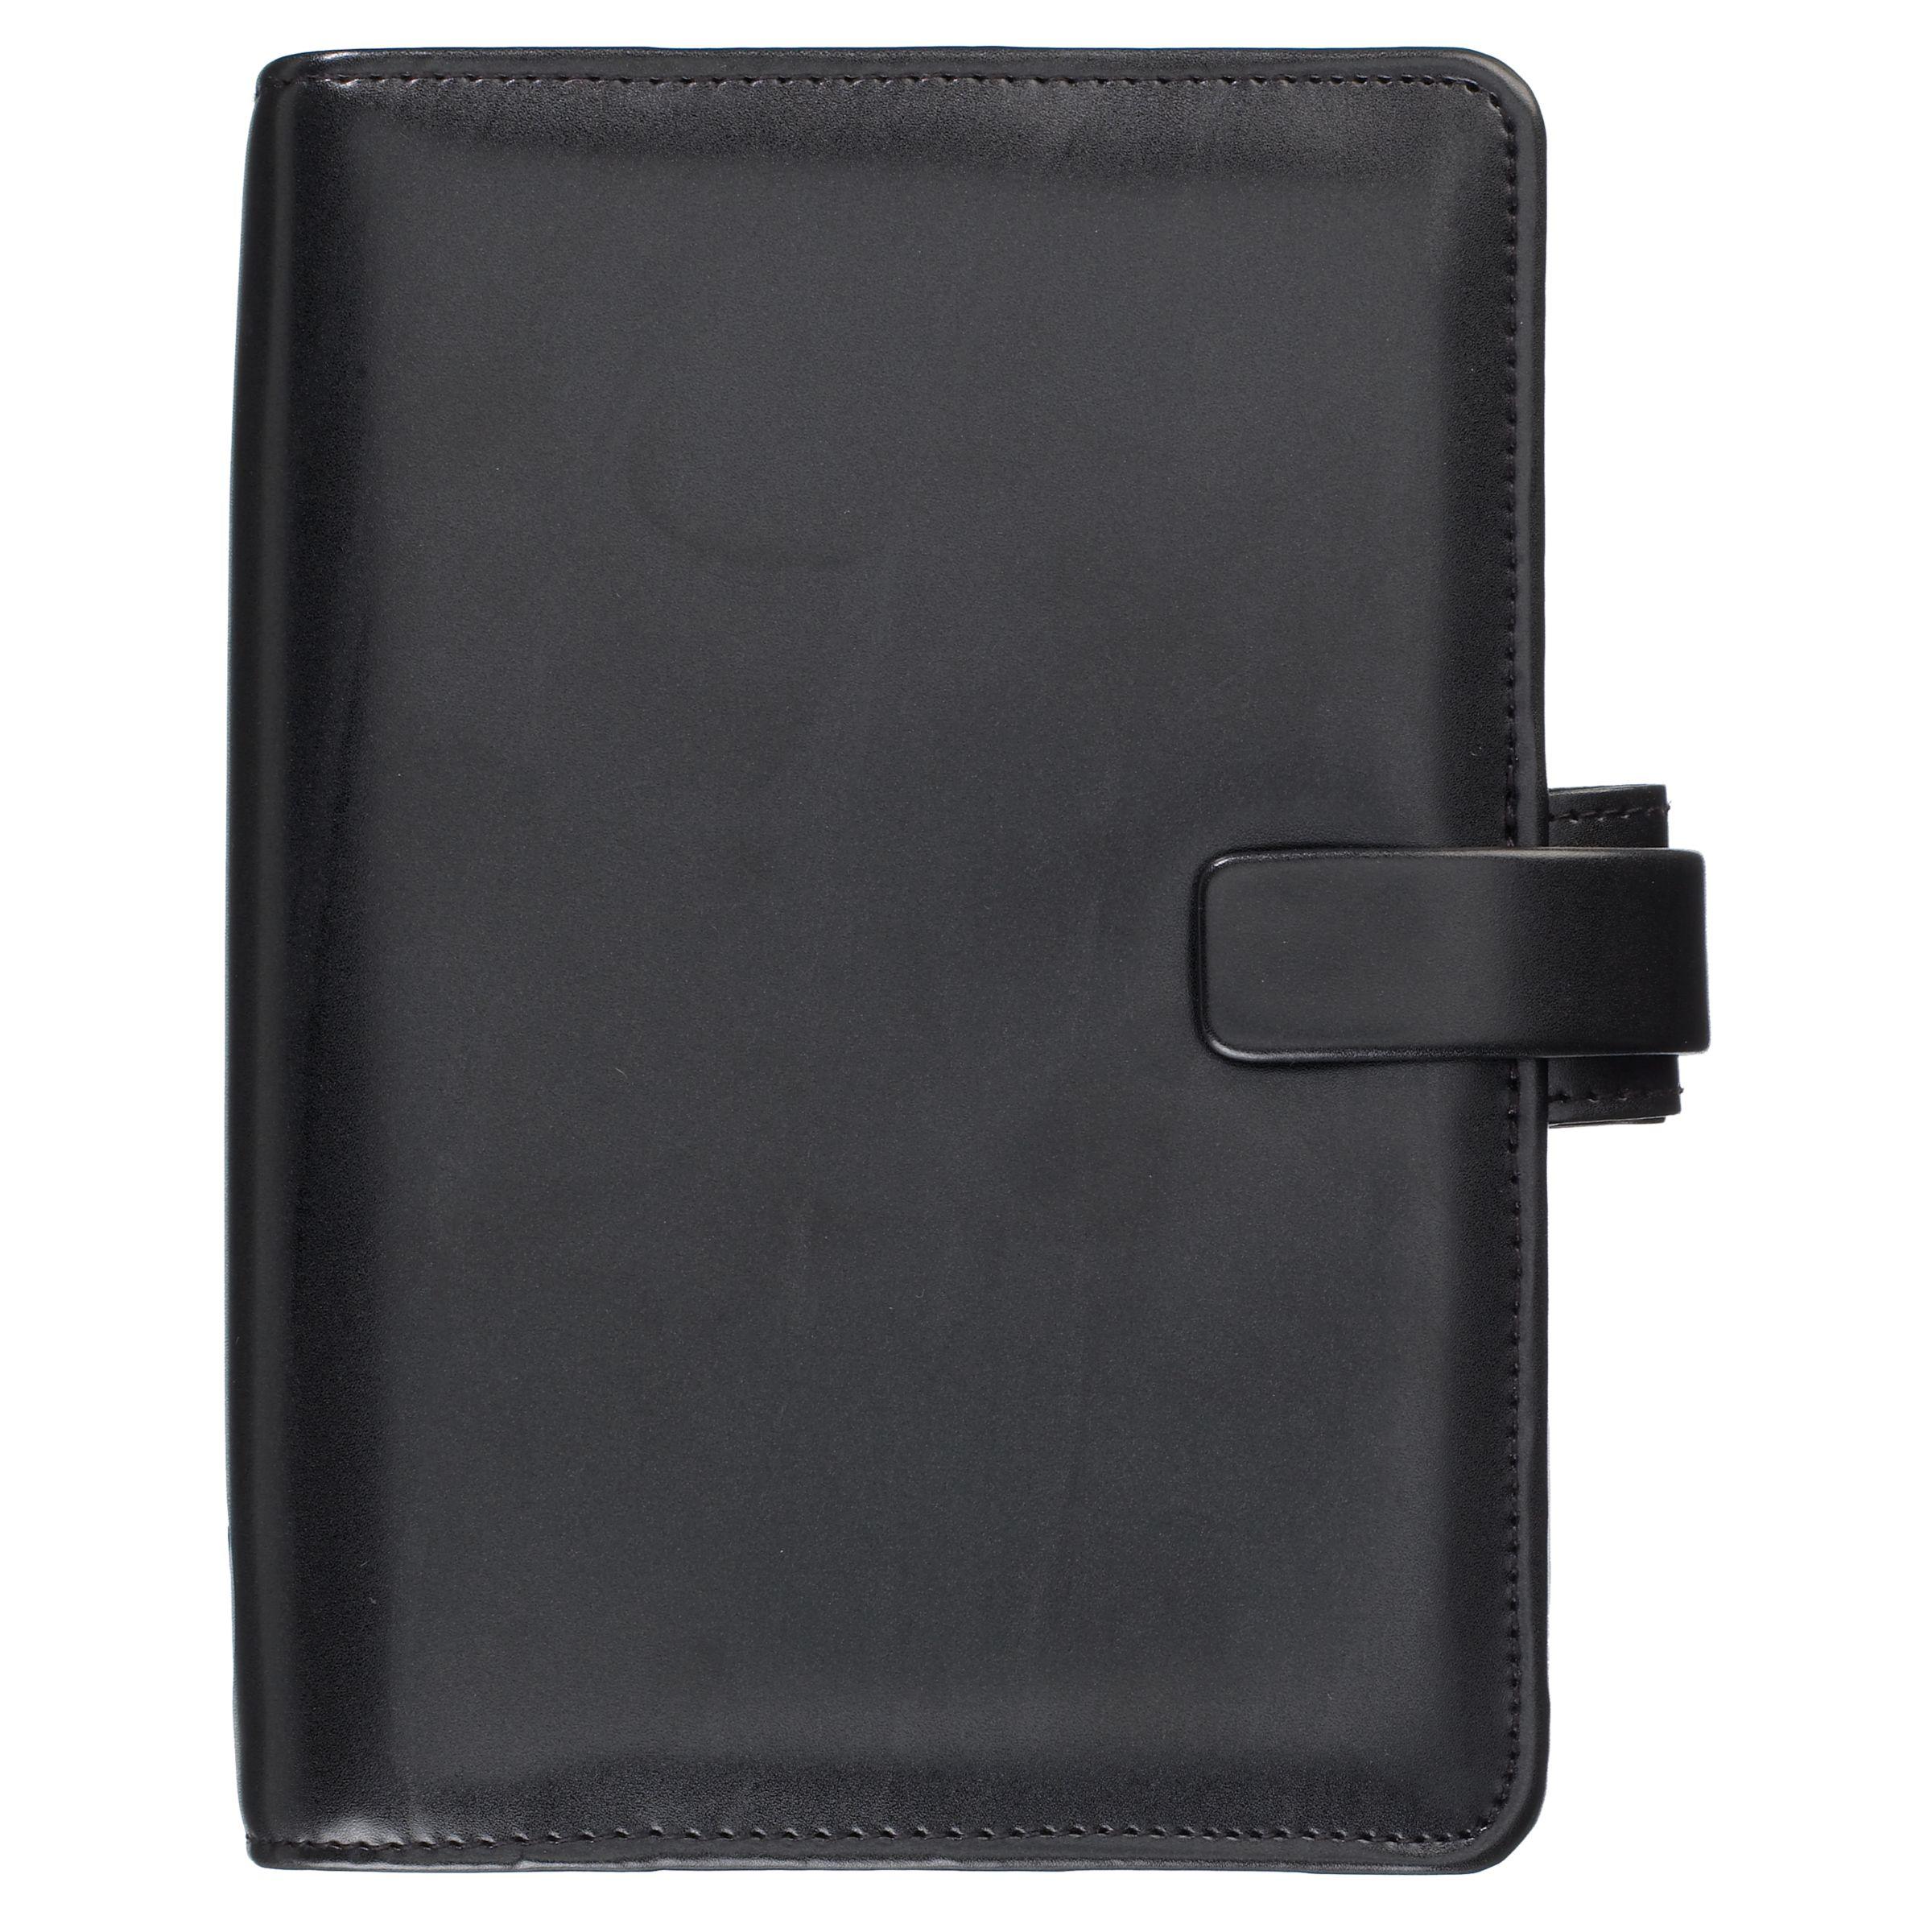 Metropol Personal Organiser, Black 169258